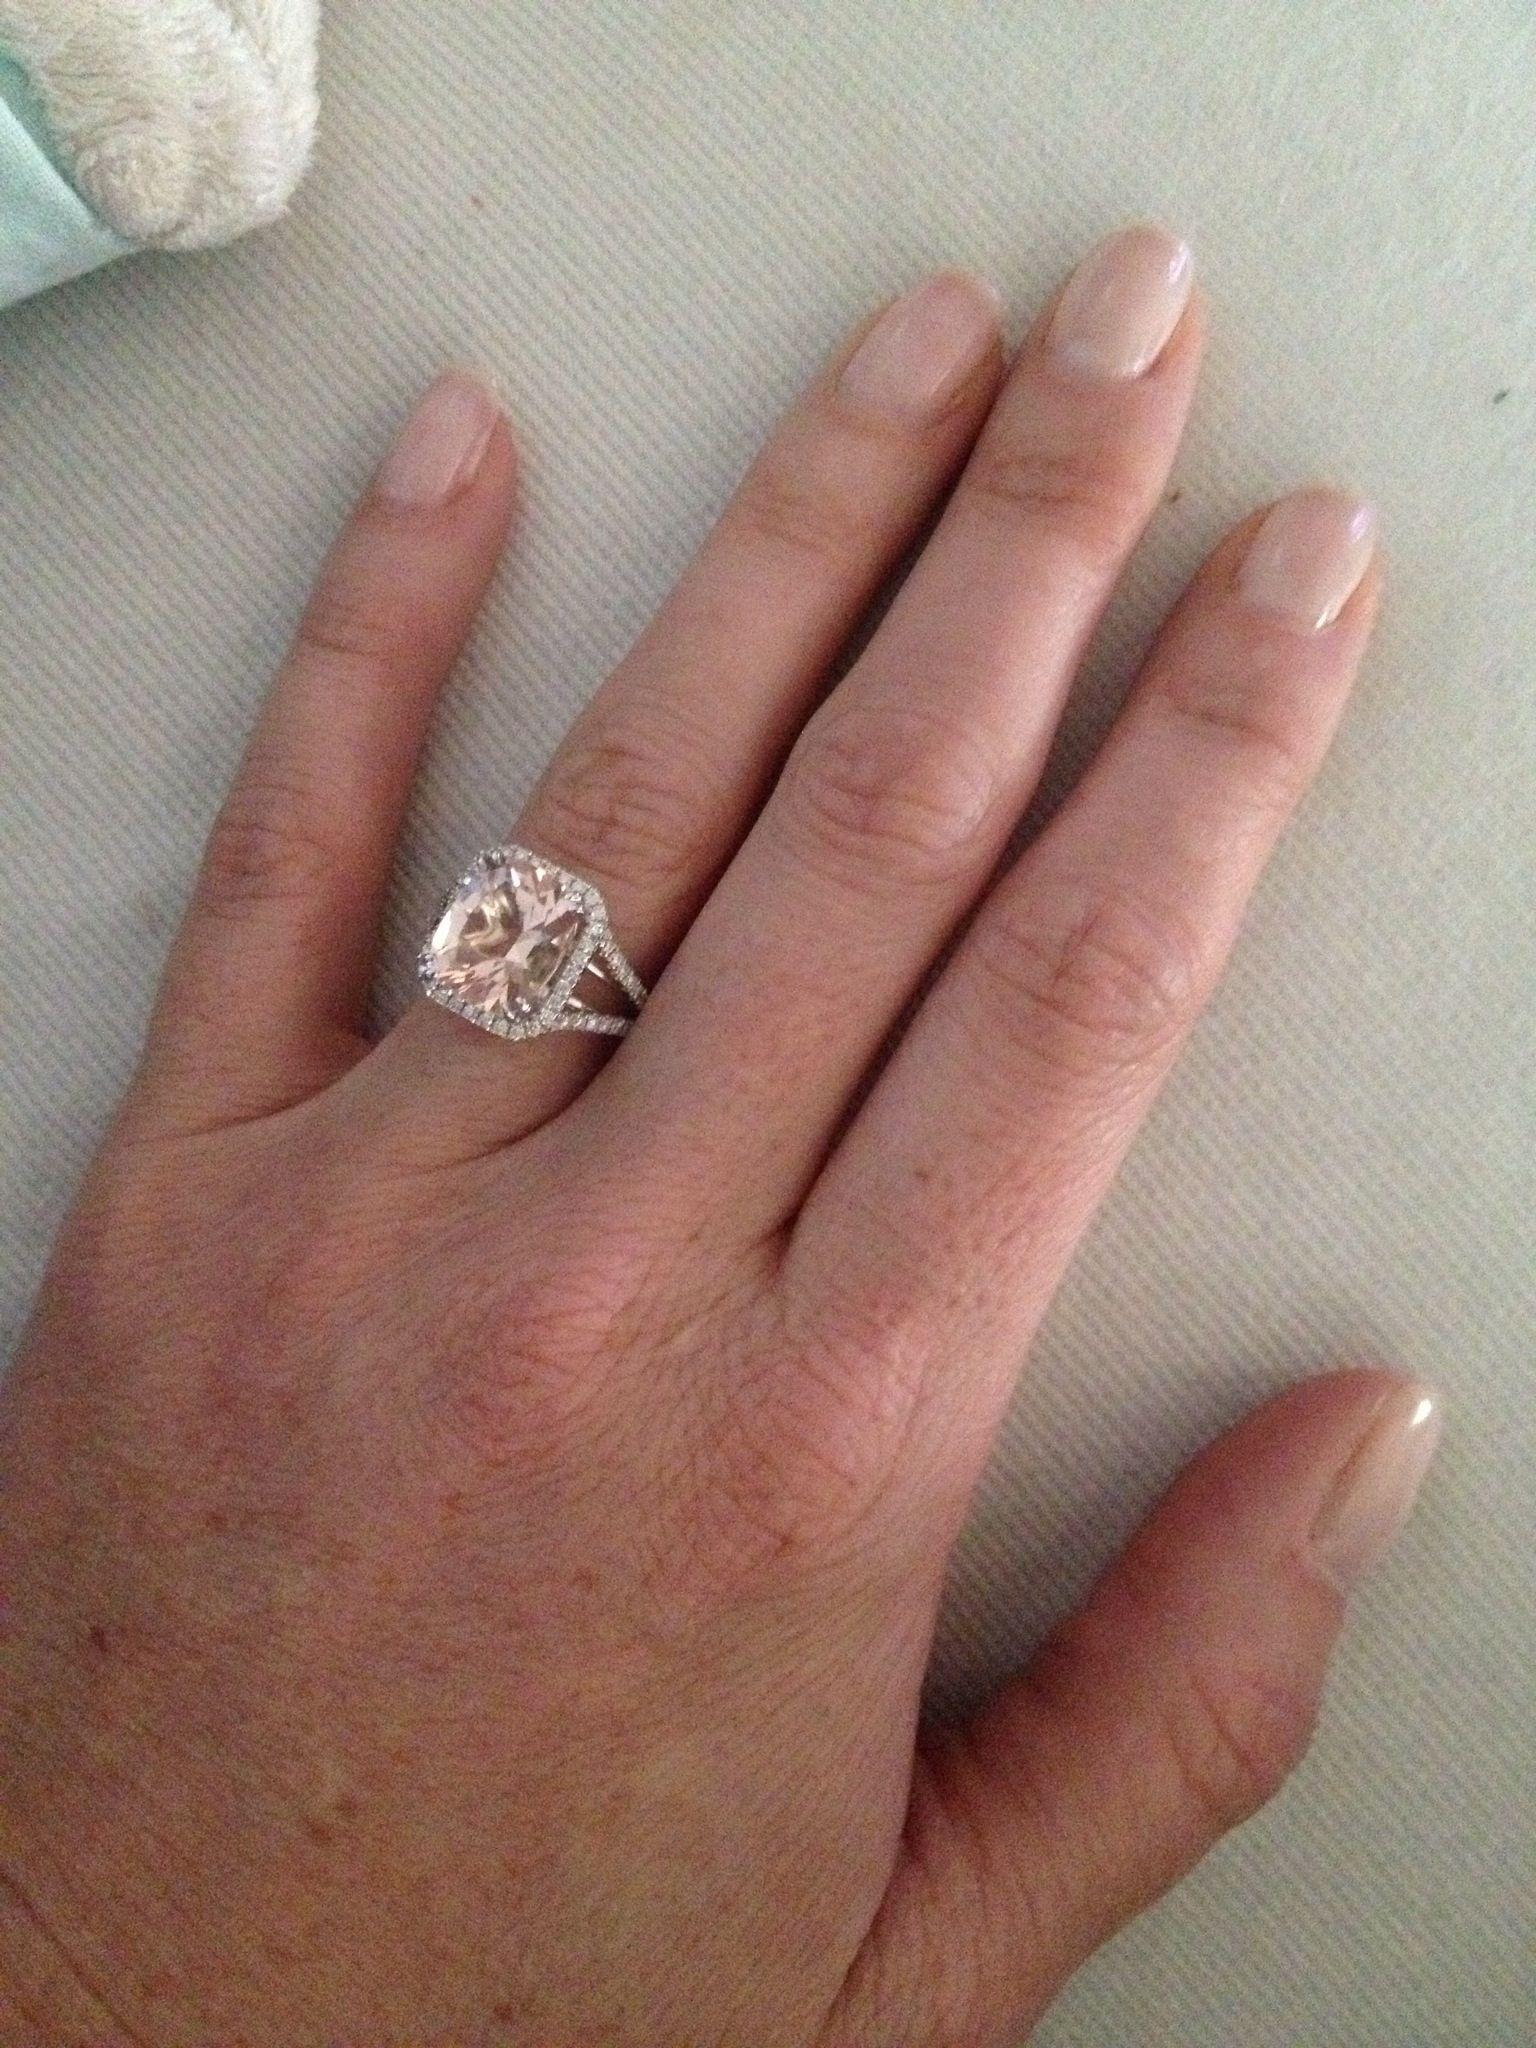 3 5 carat cushion cut morganite engagement ring with split shank